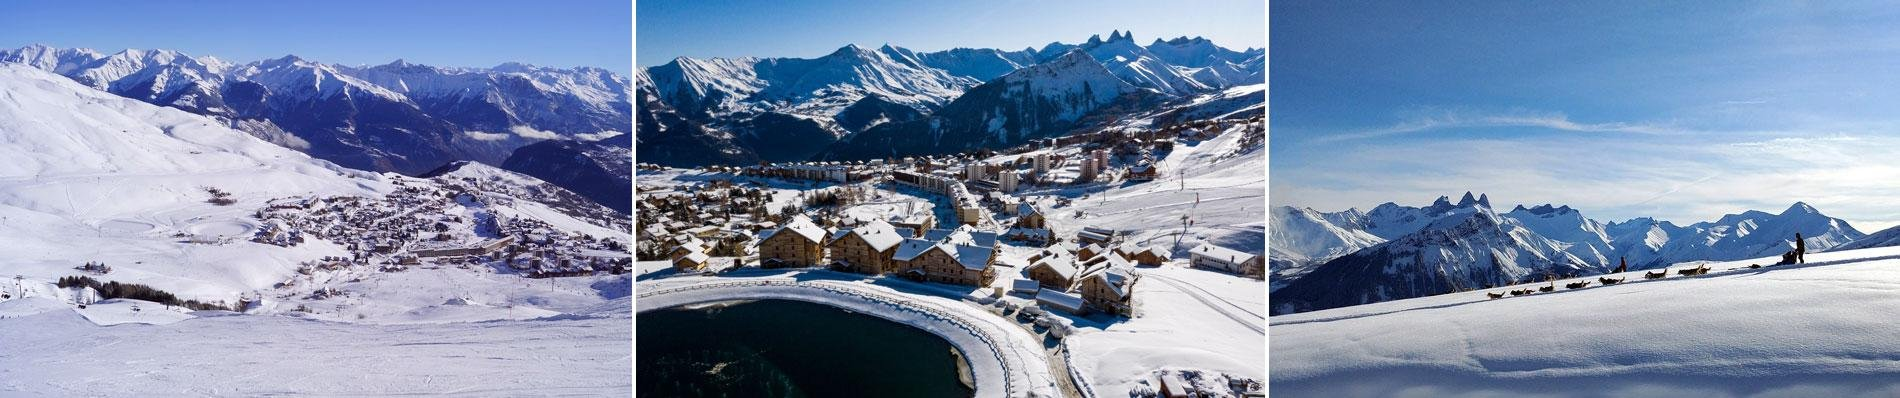 cgh la toussuire alpaga wintersport ski les sybelles